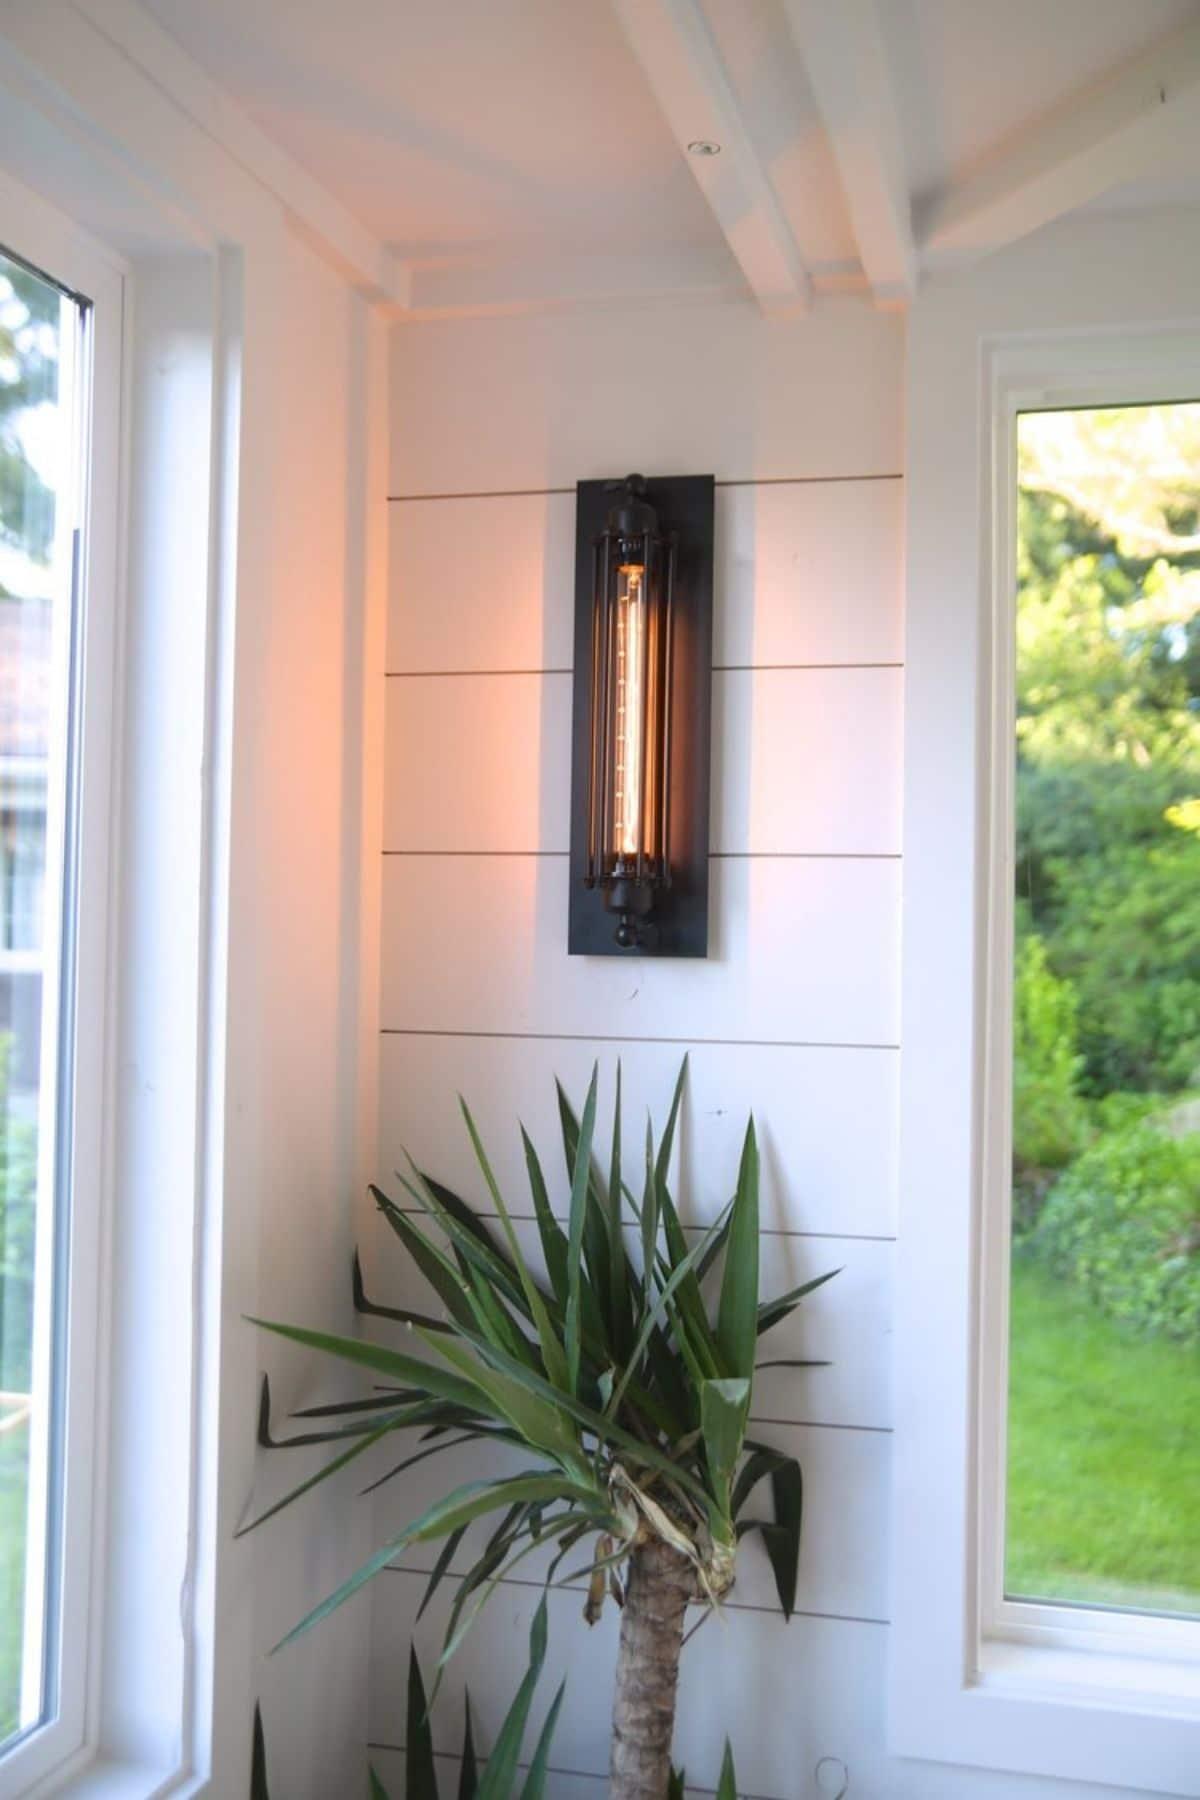 wall light between windows against white shiplap